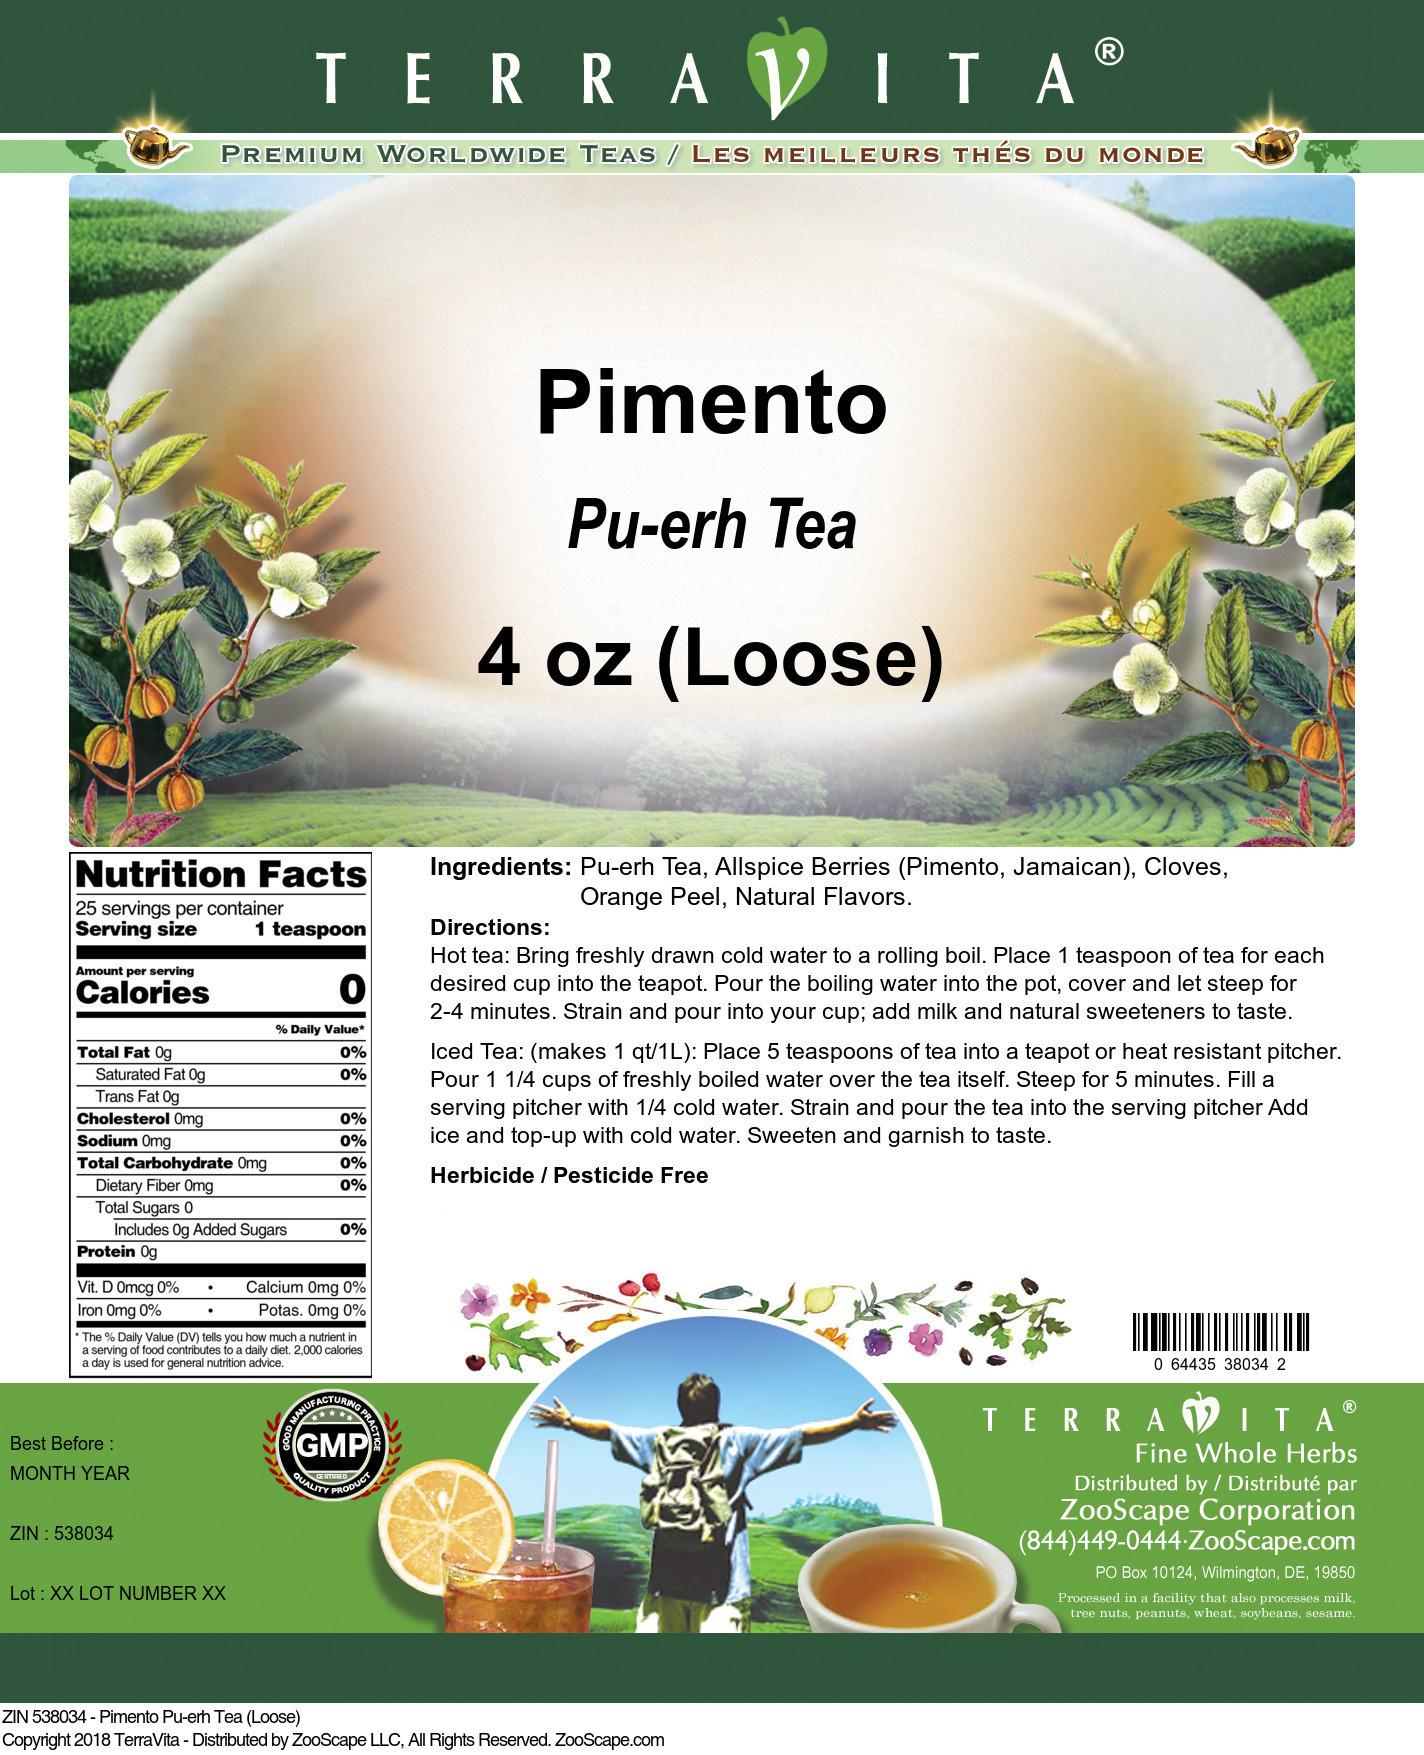 Pimento Pu-erh Tea